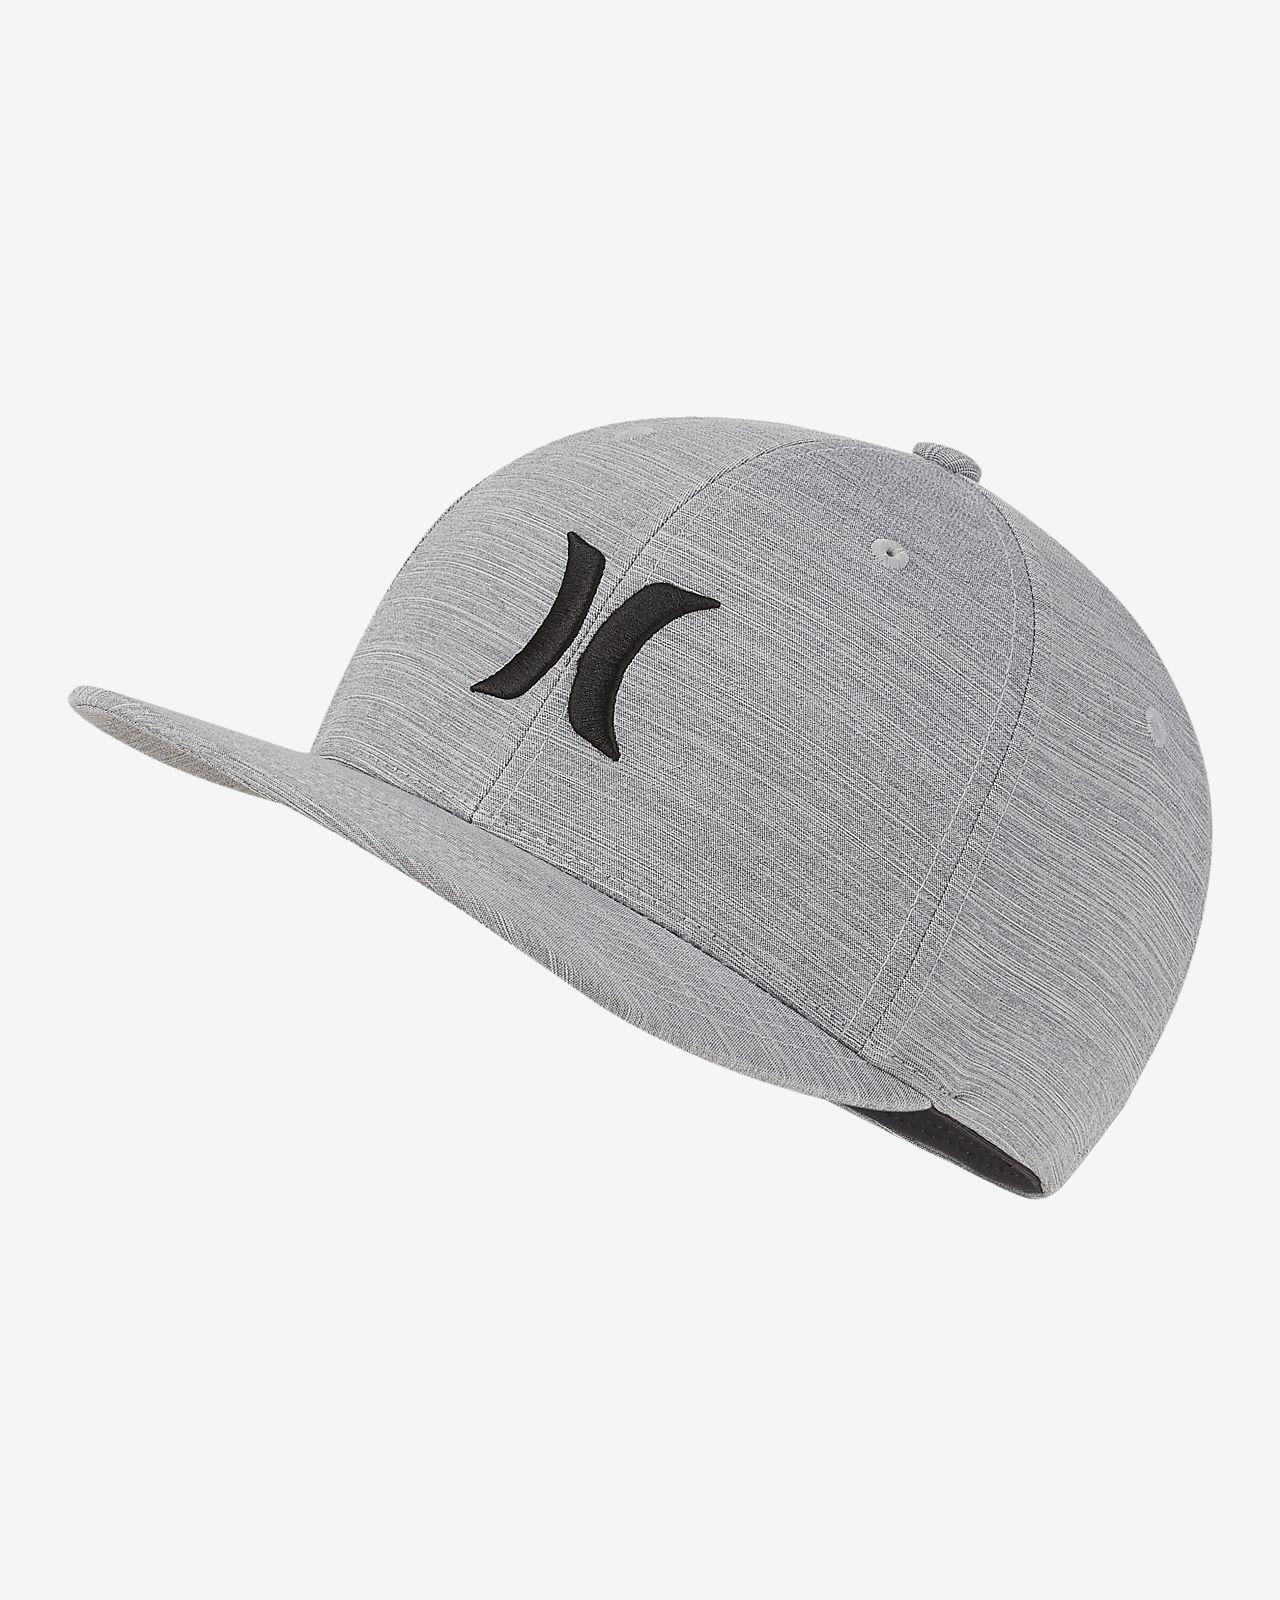 Hurley Dri-FIT Cutback Men's Hat